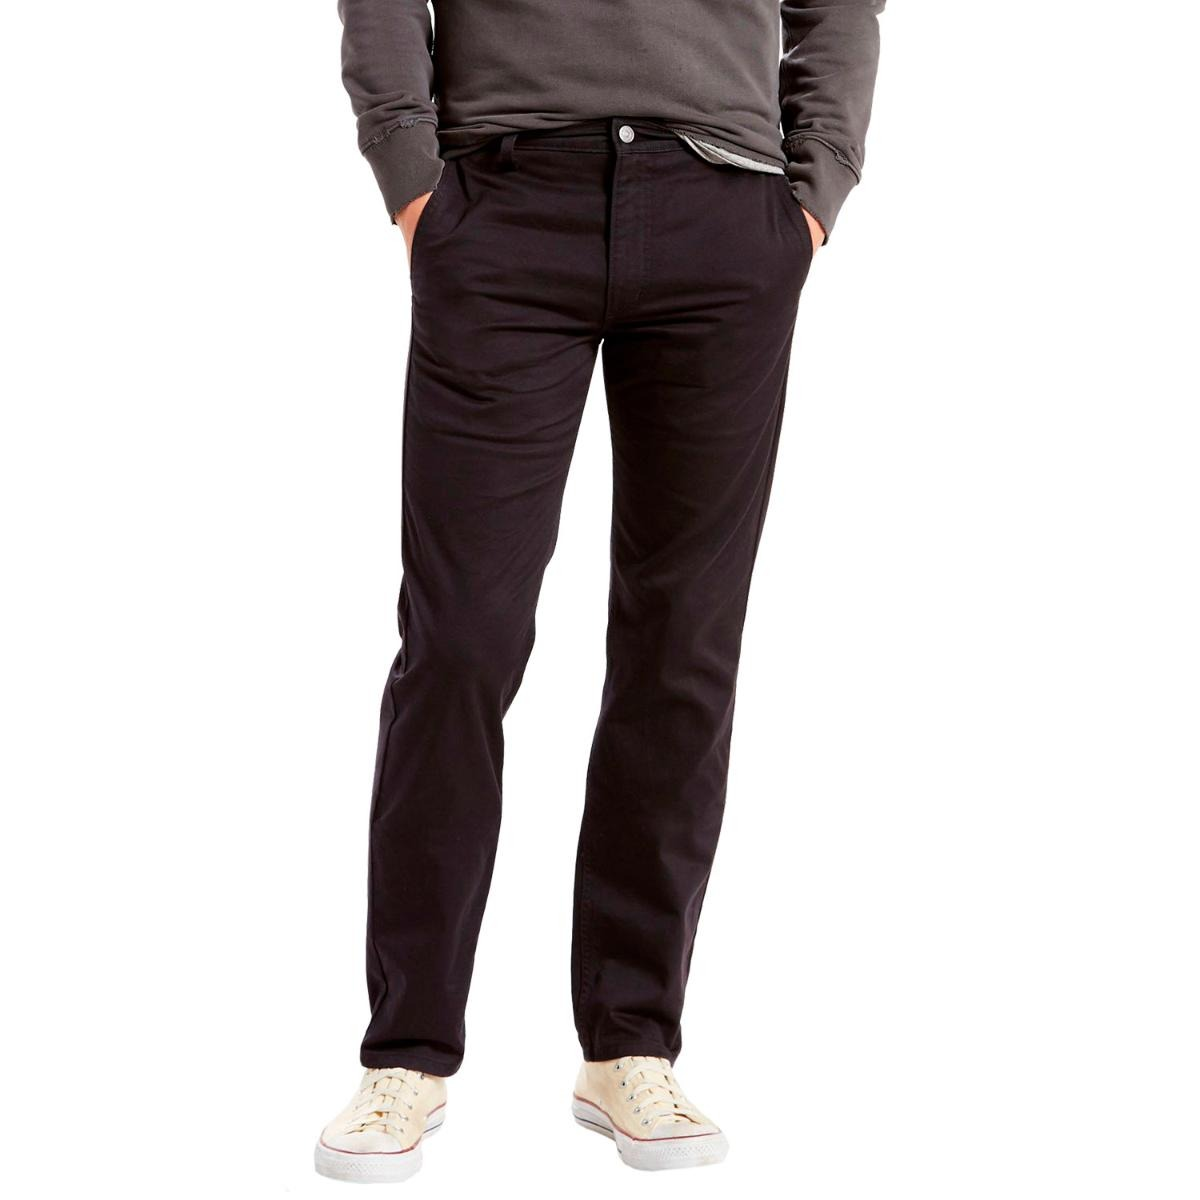 072bab0abff2d calça chino levis masculino 511 slim hybrid trouser preto. Carregando zoom.